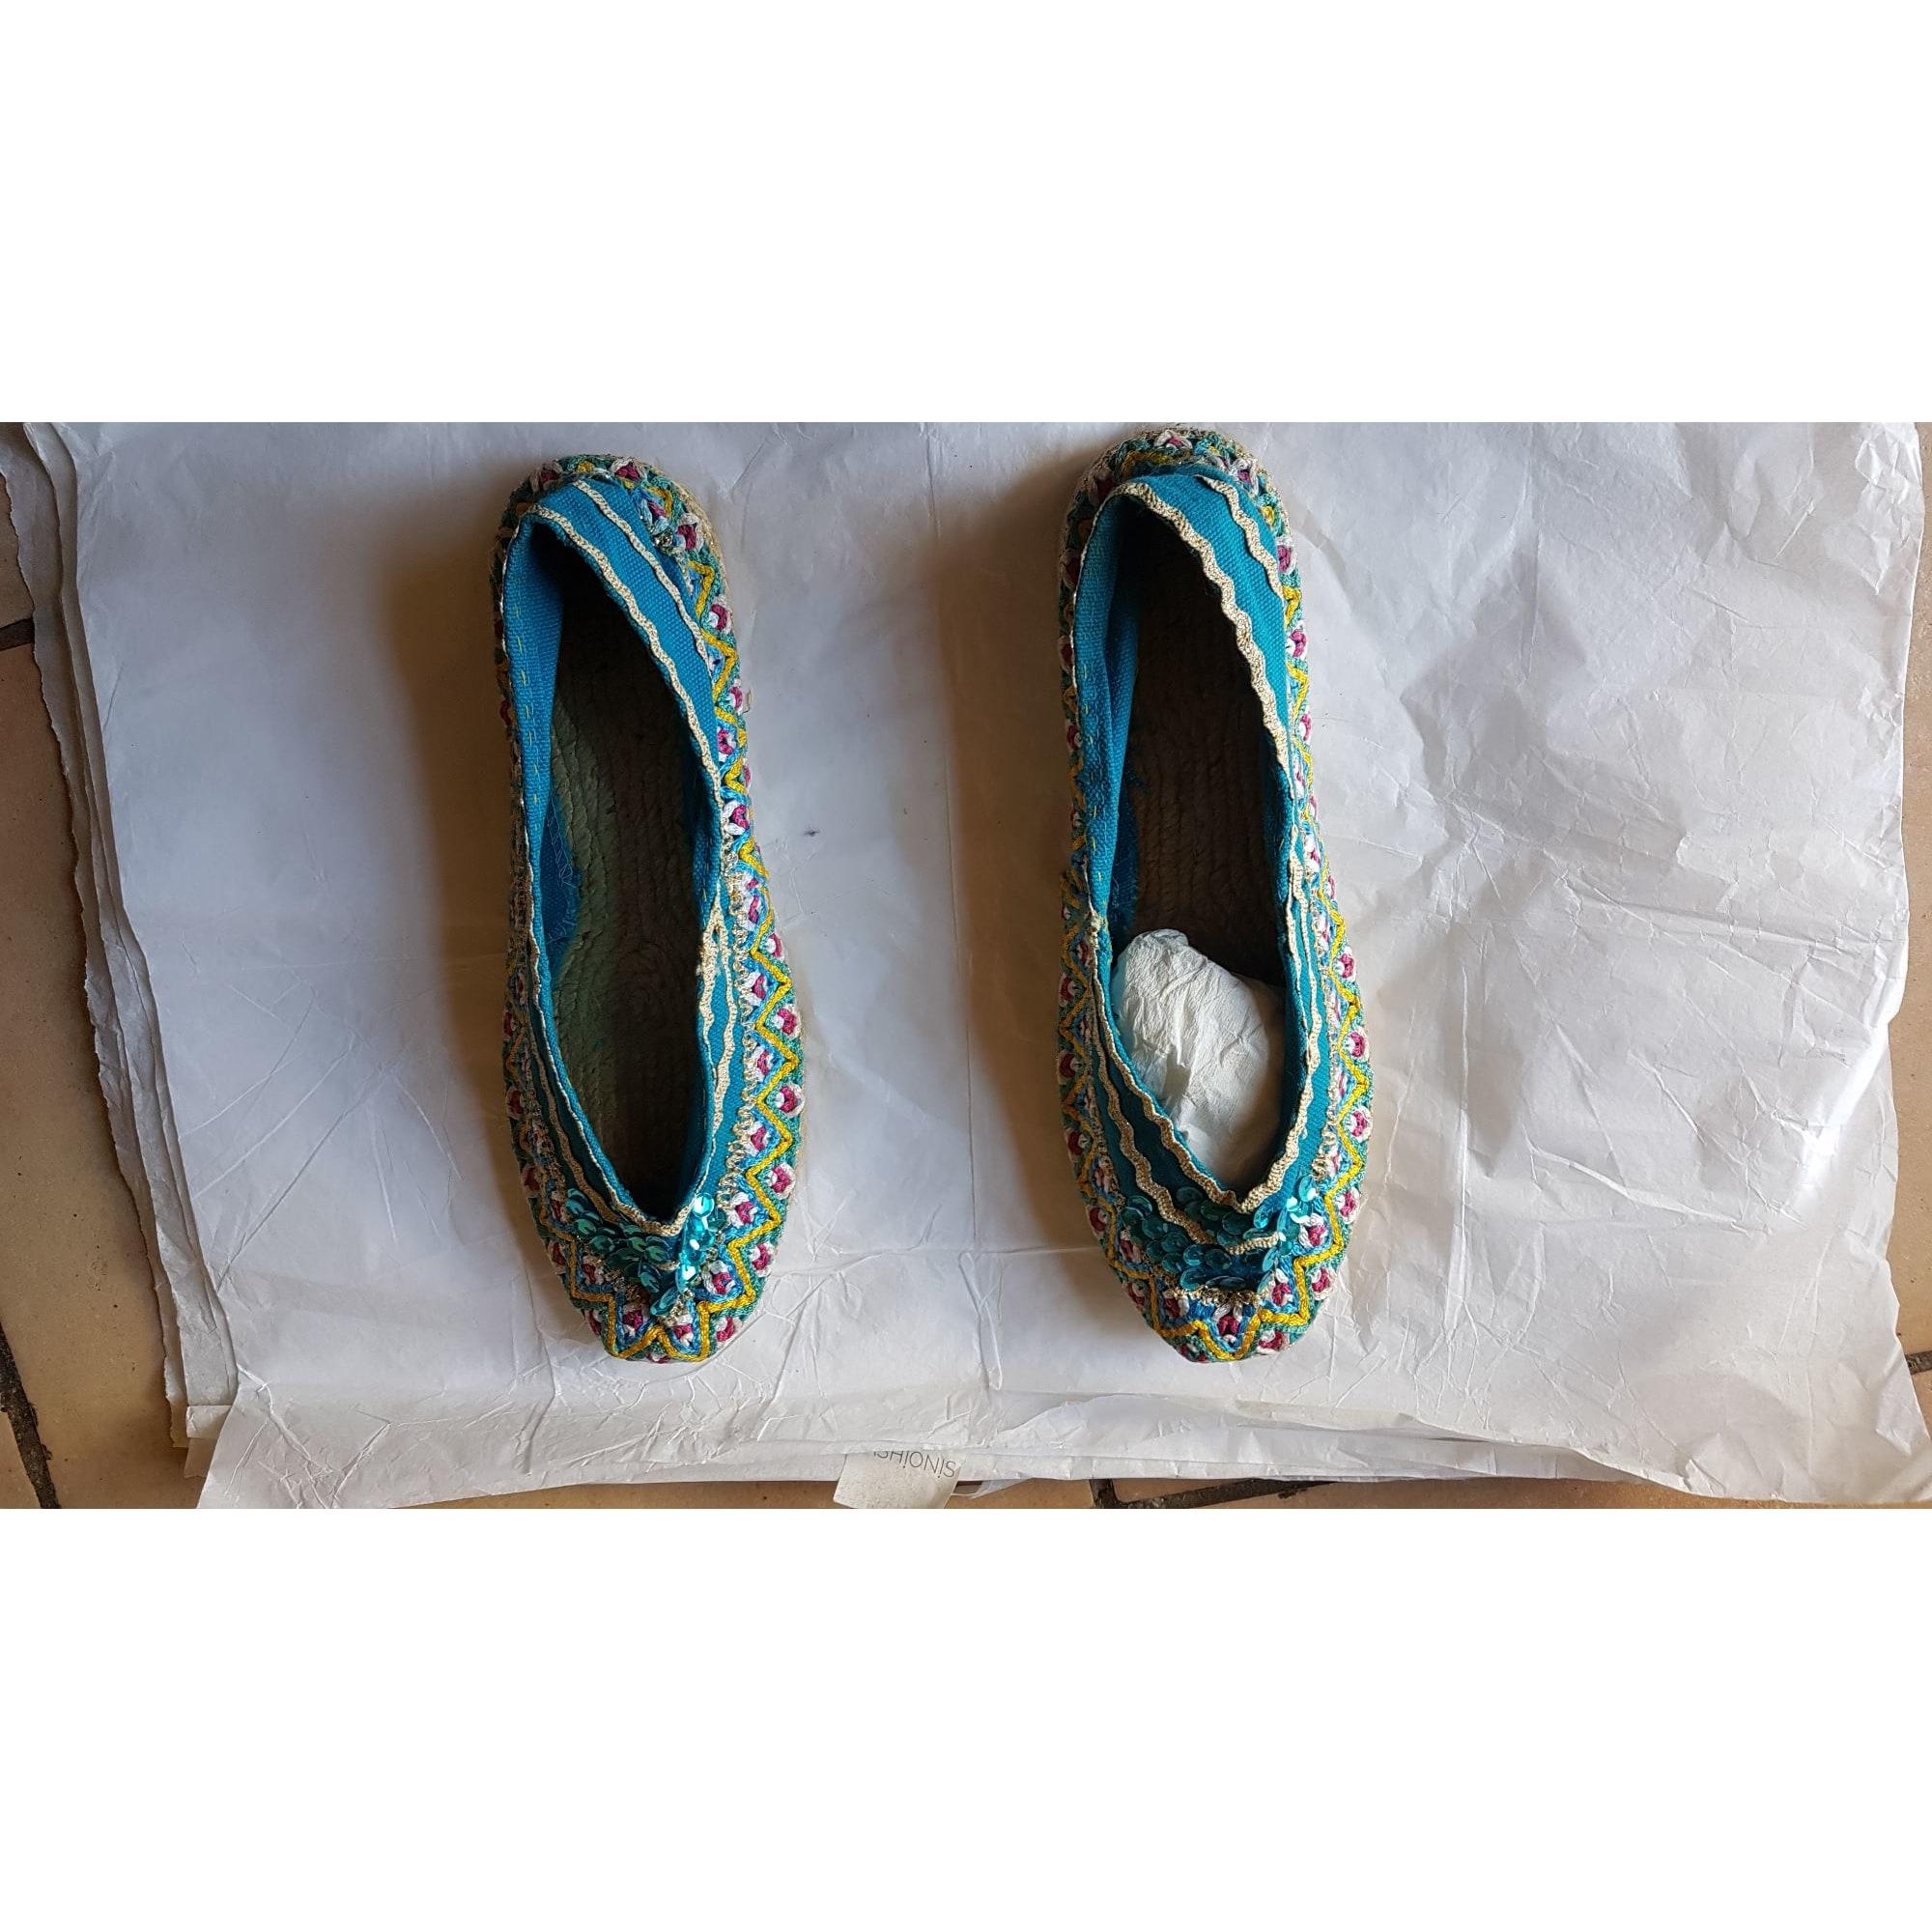 Ballerines MARQUE INCONNUE Bleu, bleu marine, bleu turquoise